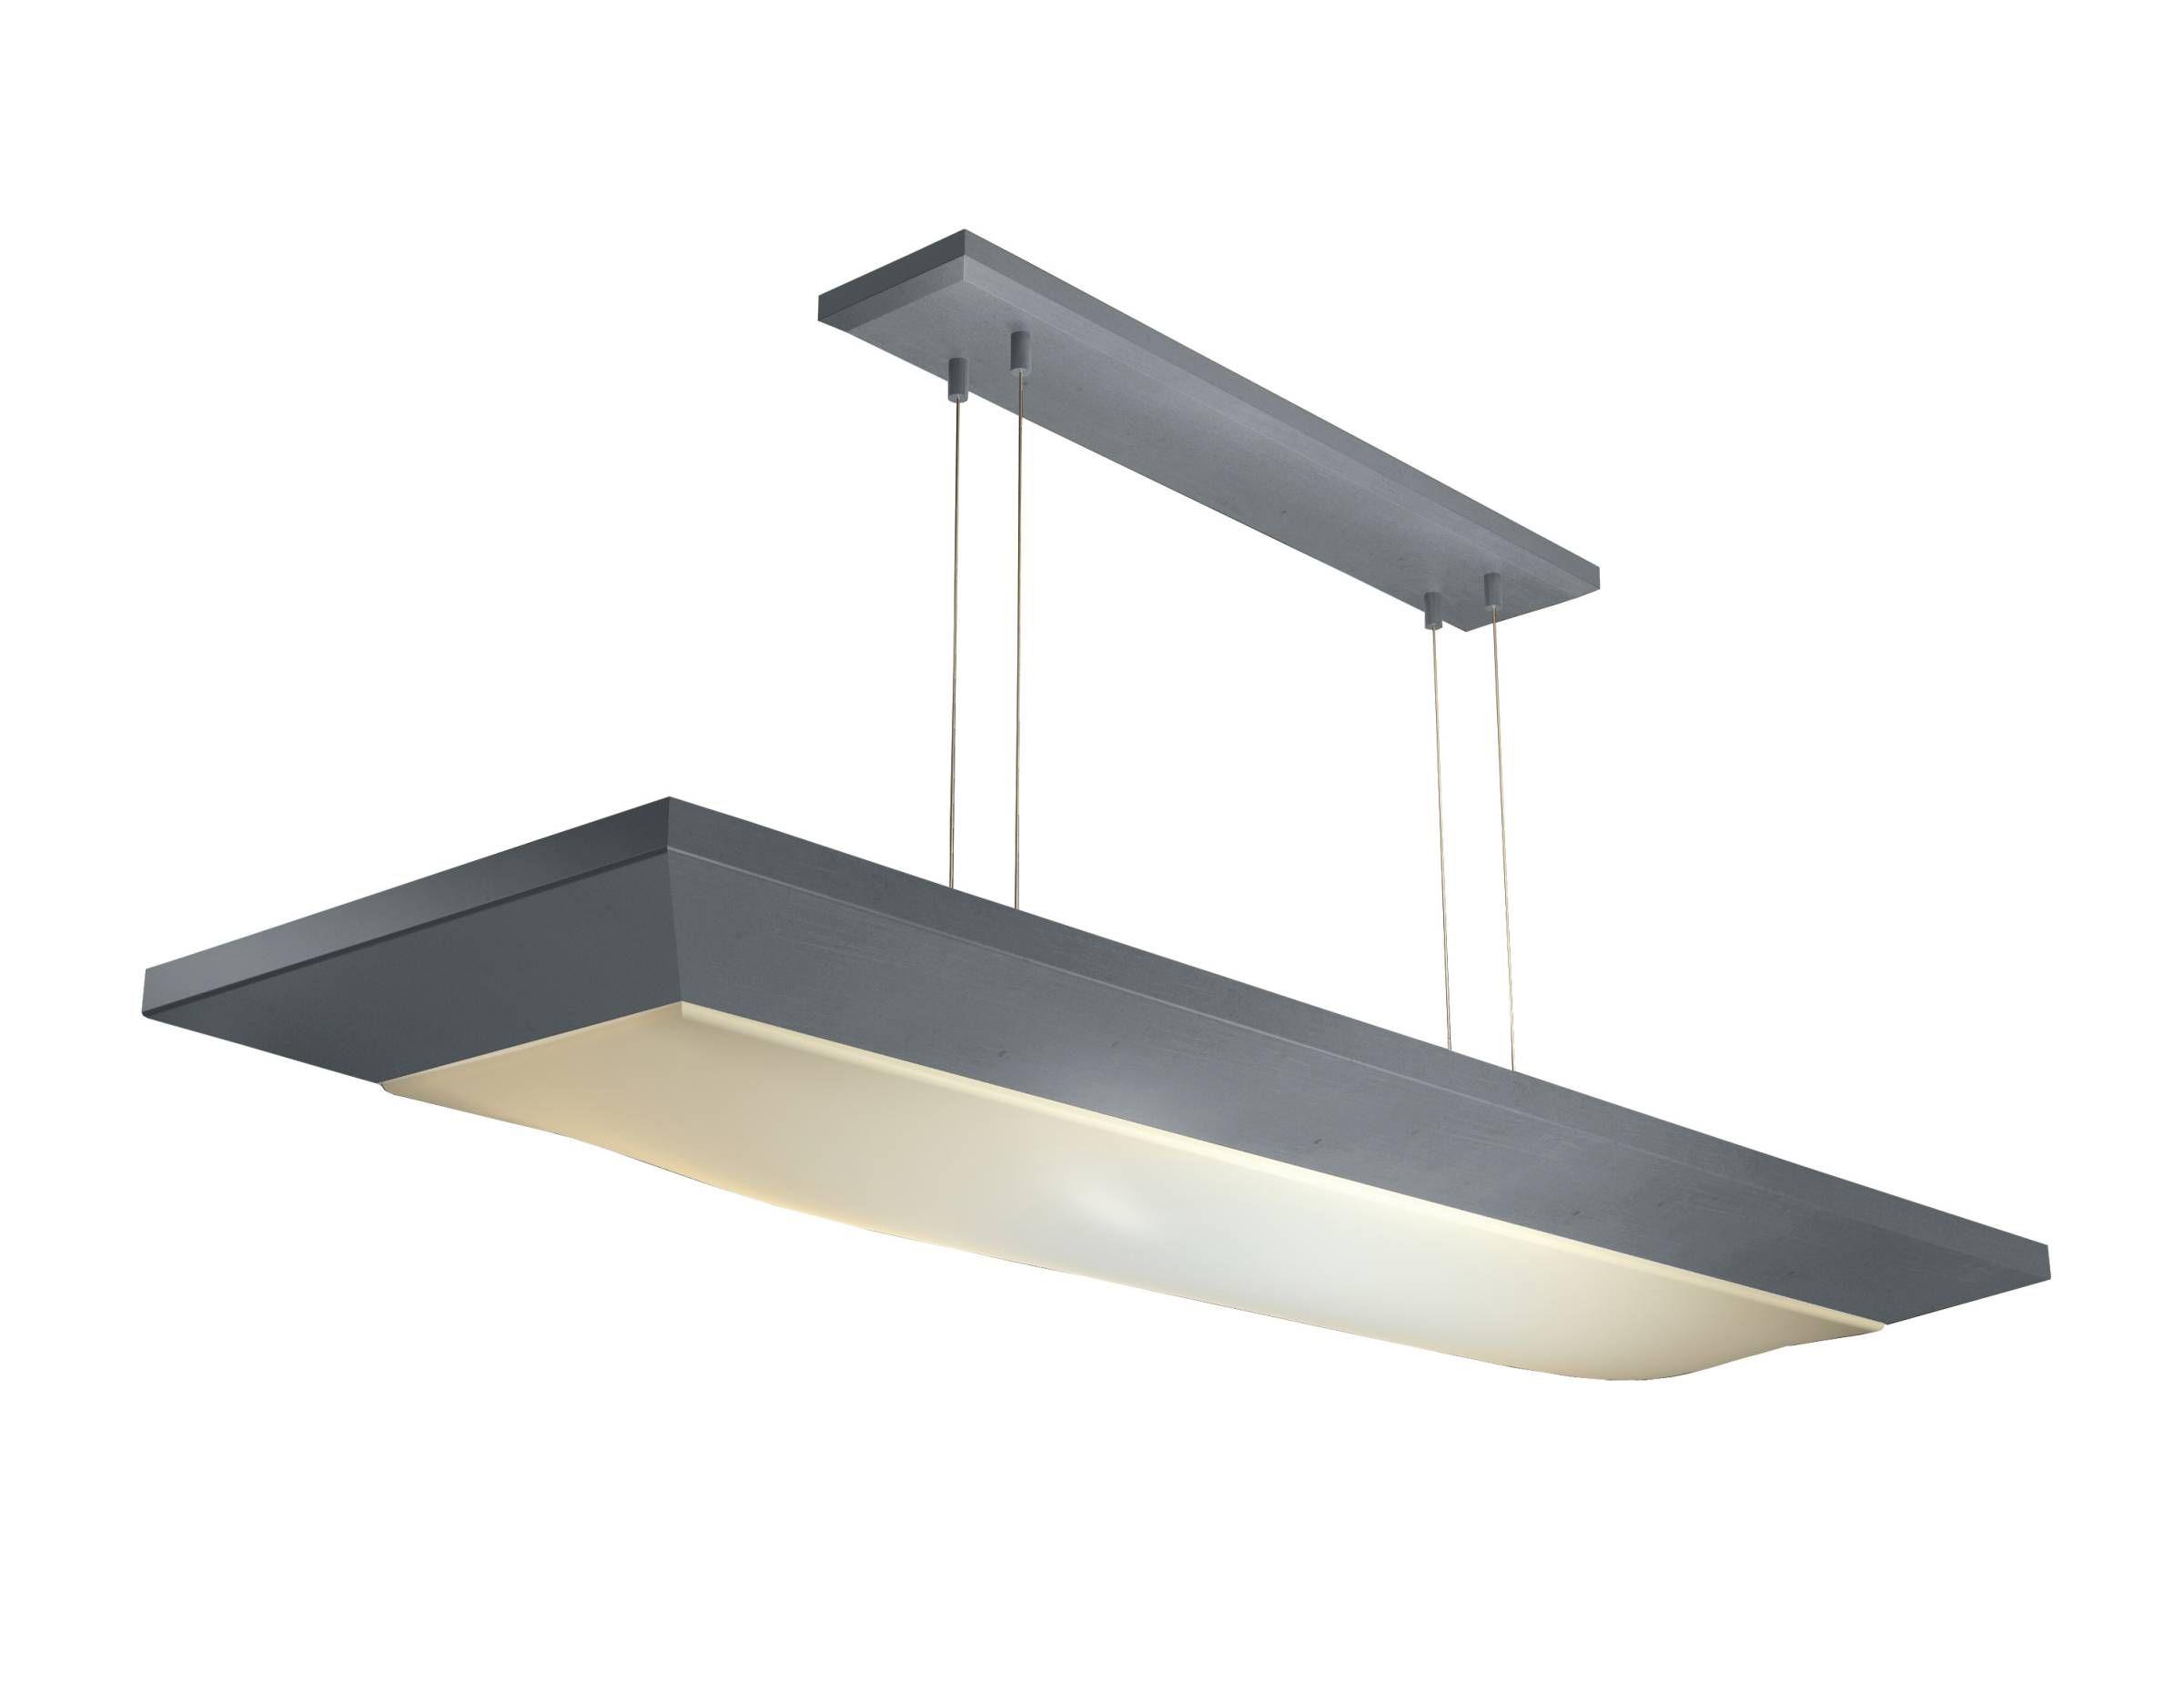 room-lights-kitchen-light-bathroom-light-fixtures-light-lighting ...